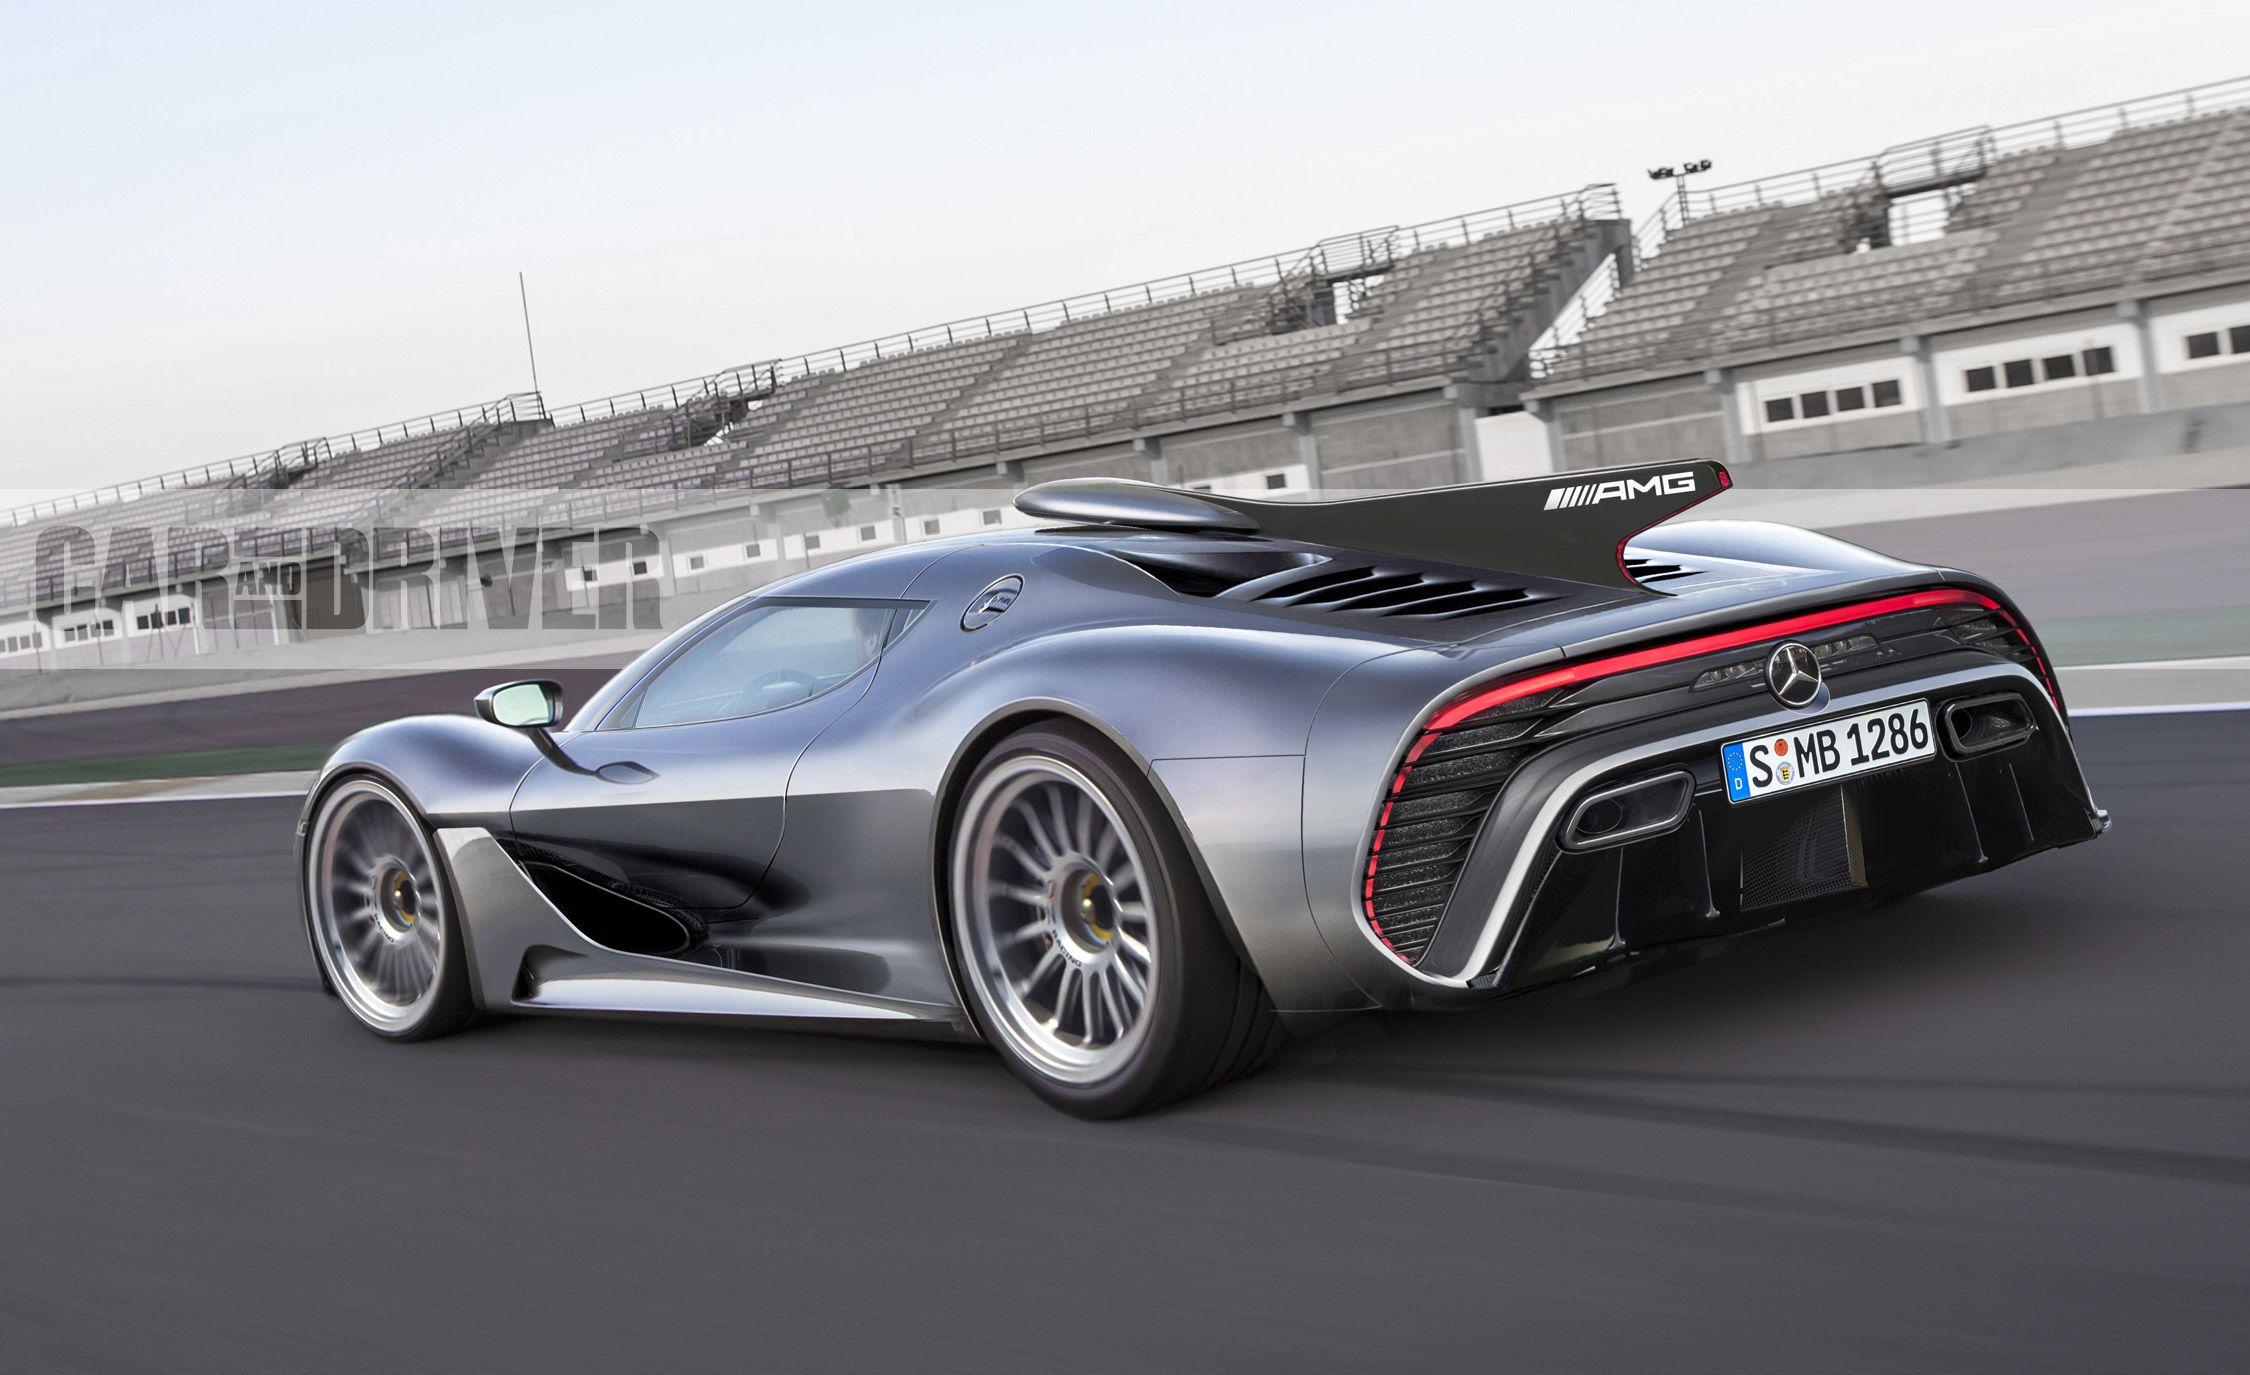 Mercedes-AMG Project One: 1000-Plus HP, 10,000-Plus-RPM Redline